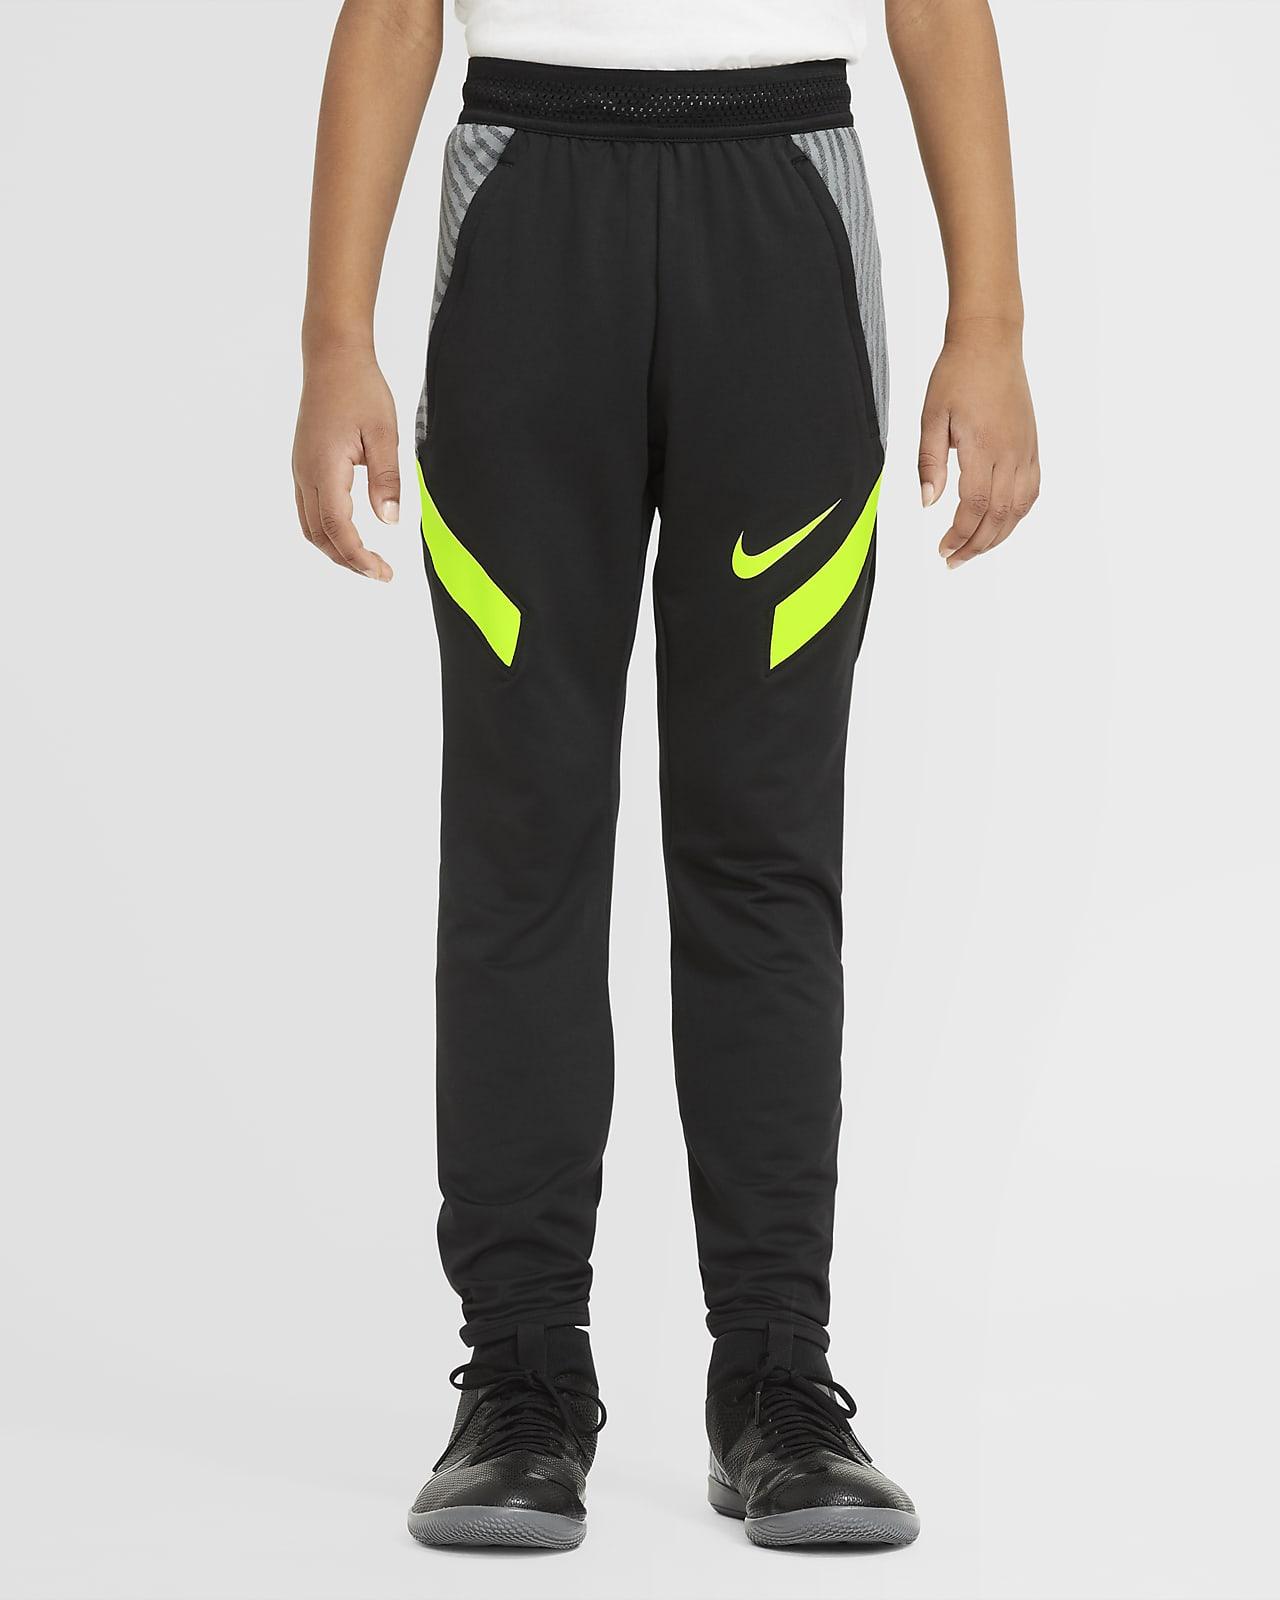 Pantaloni da calcio Nike Dri-FIT Strike - Ragazzi